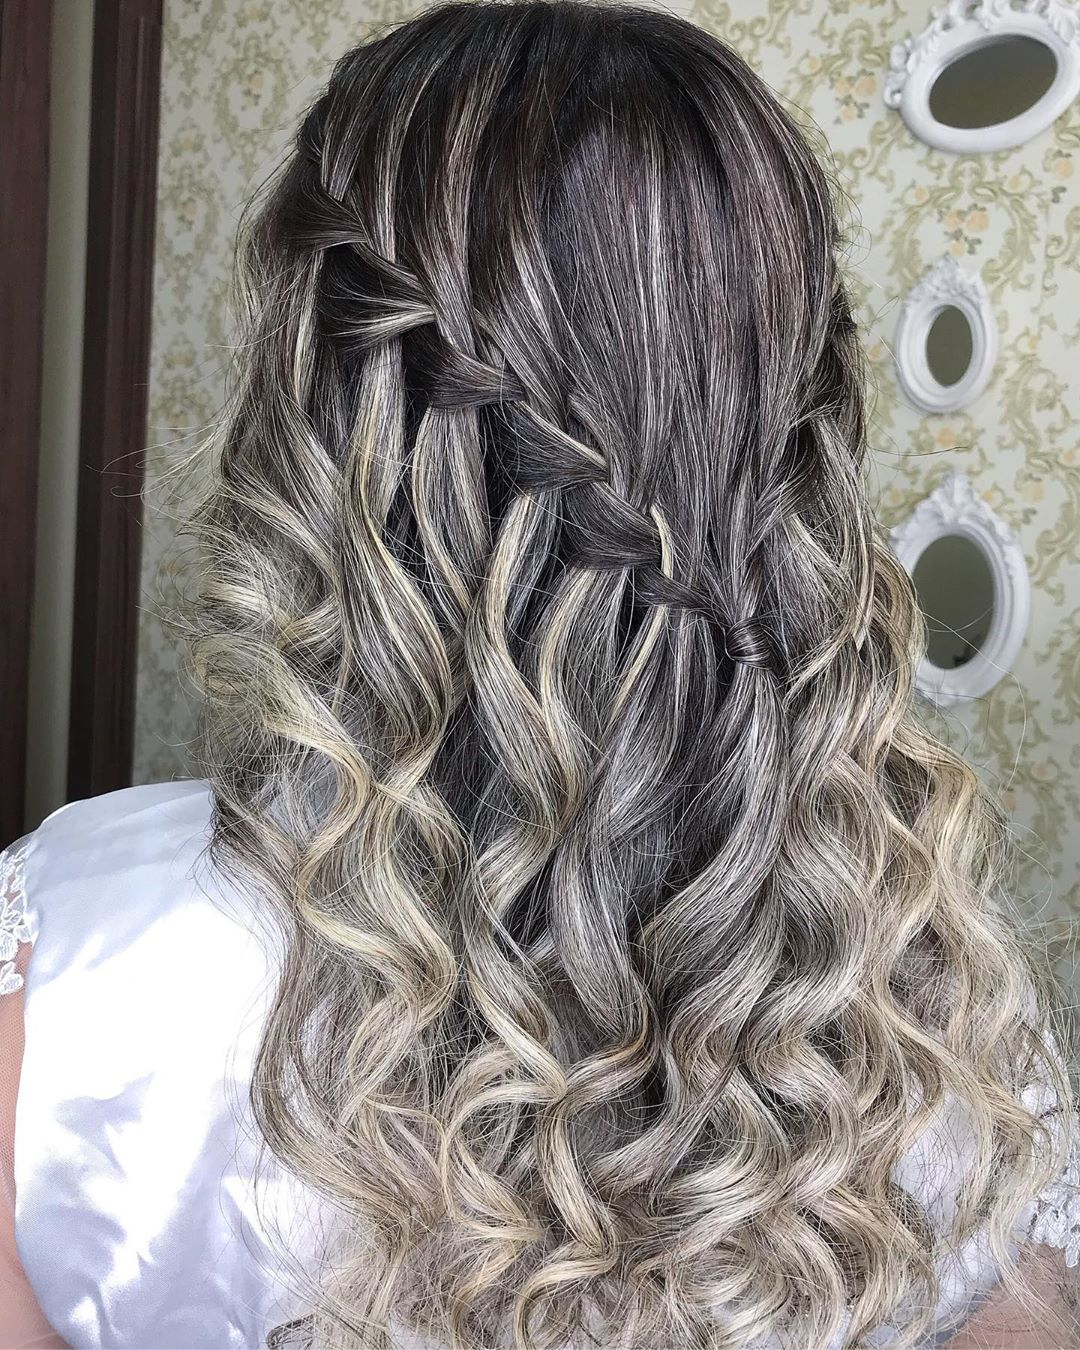 penteados para festa cabelo solto